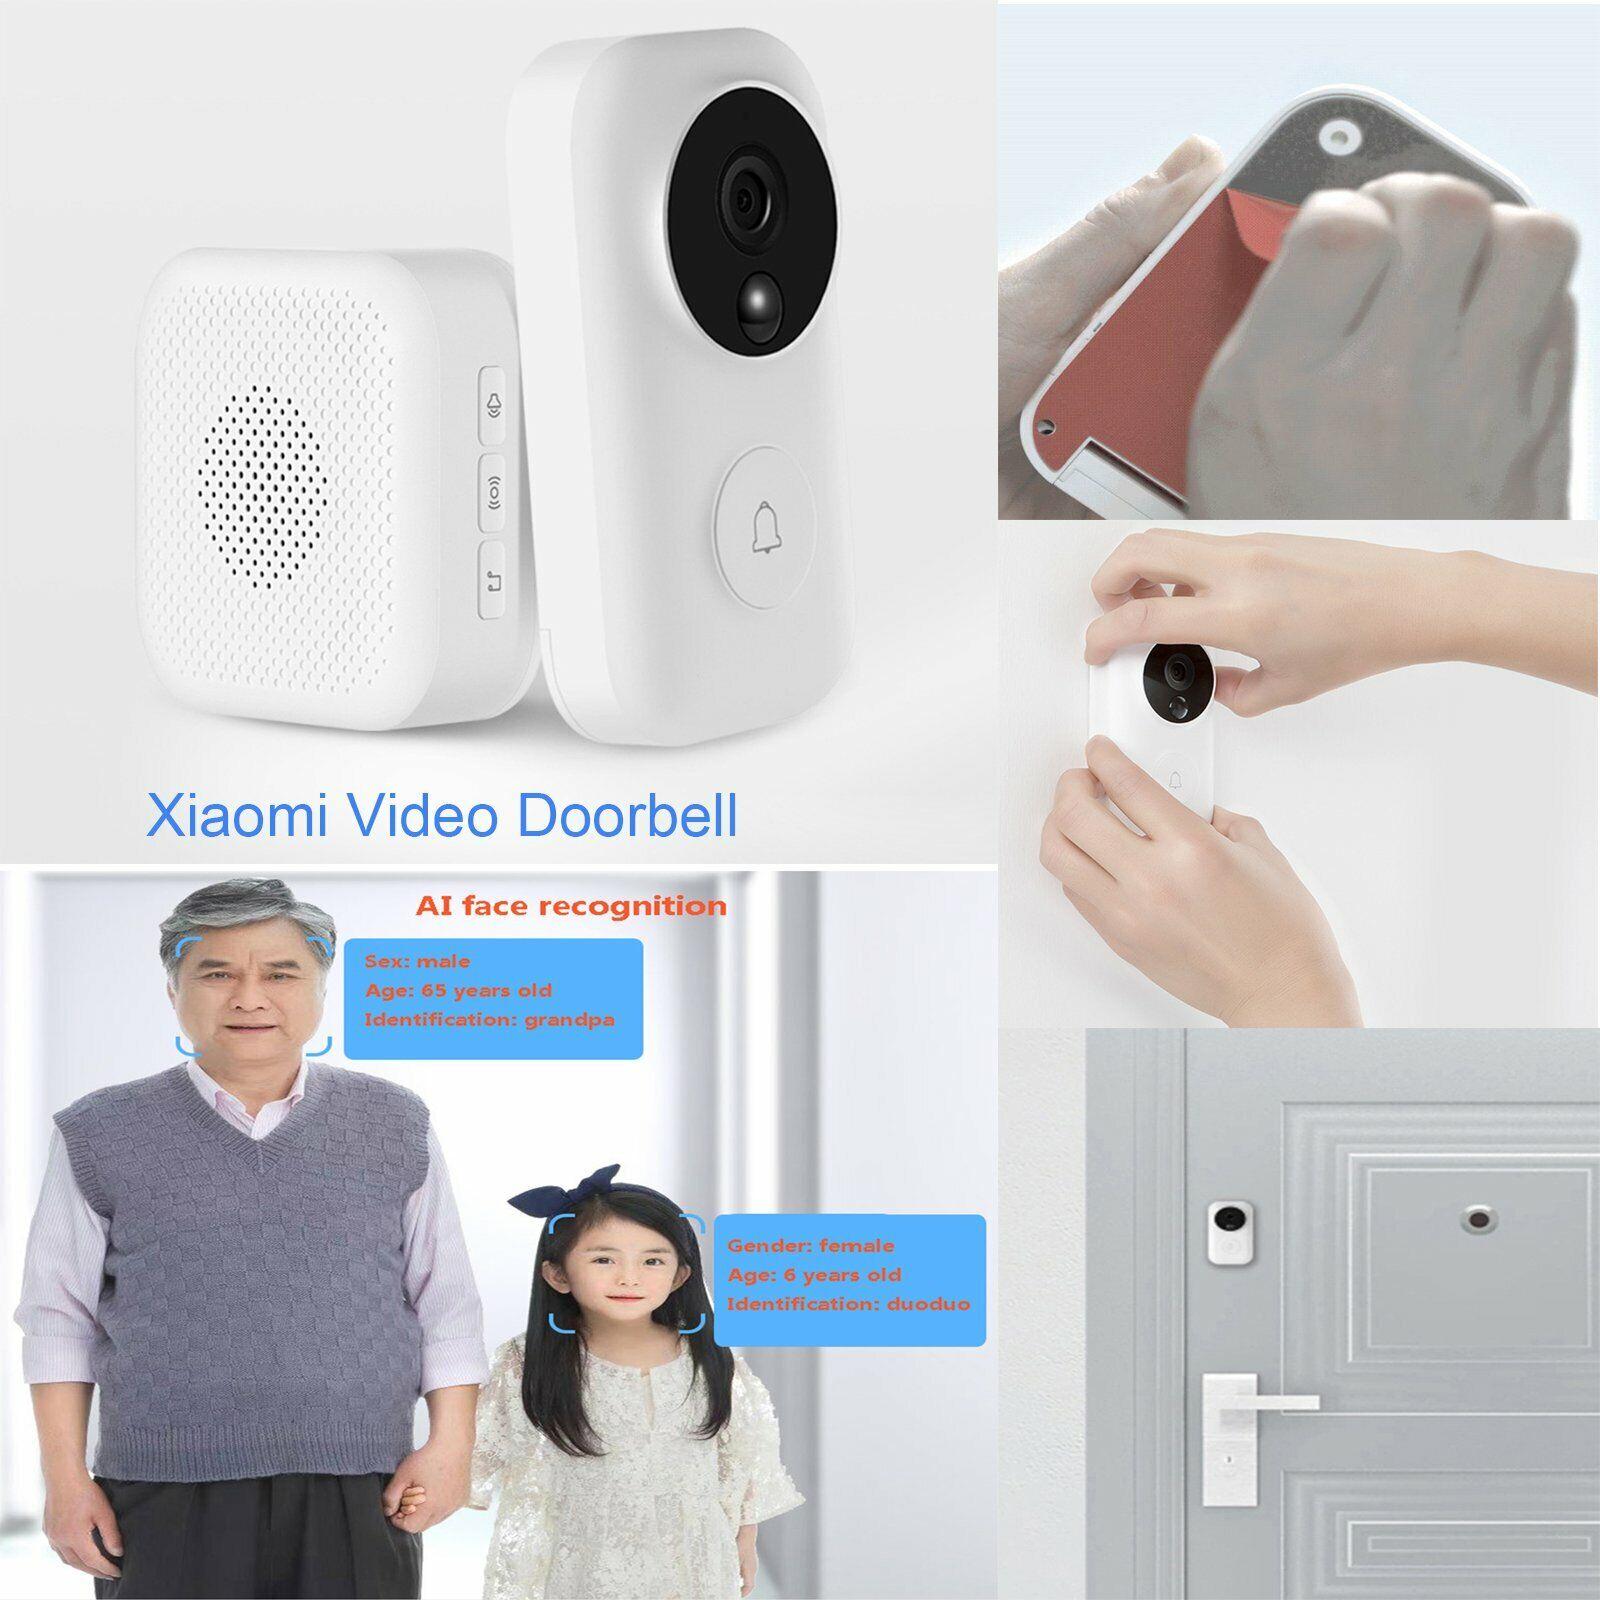 Xiaomi Zero Intelligent AI Face Identification Bell 720P WiFi Video Doorbell Set